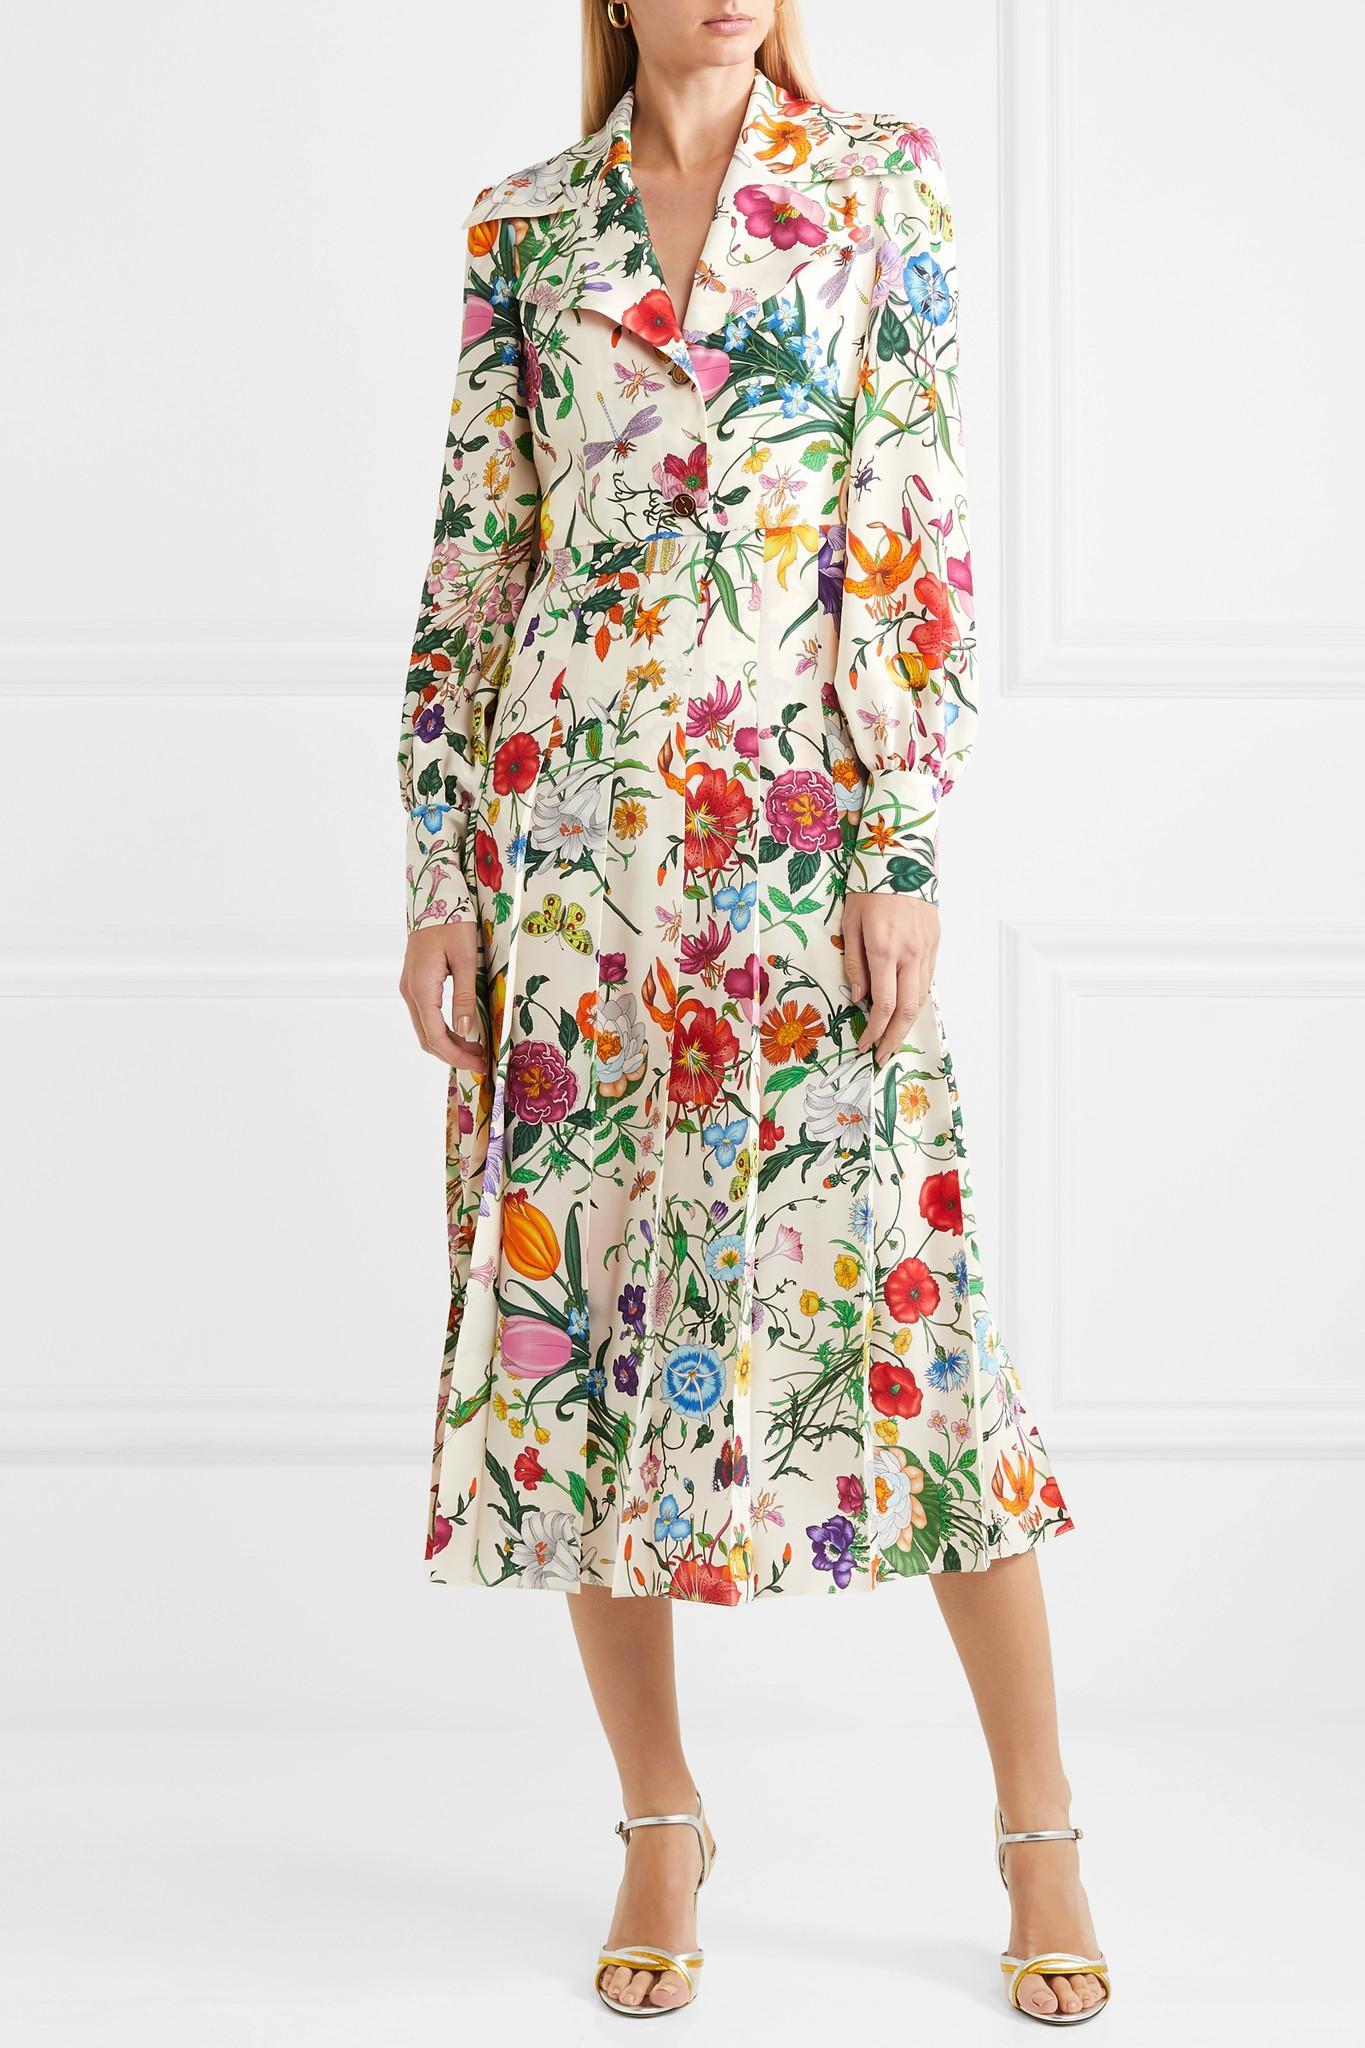 dca63b00f86e1e Gucci Floral Print Silk Shirt Dress in White - Save 25% - Lyst